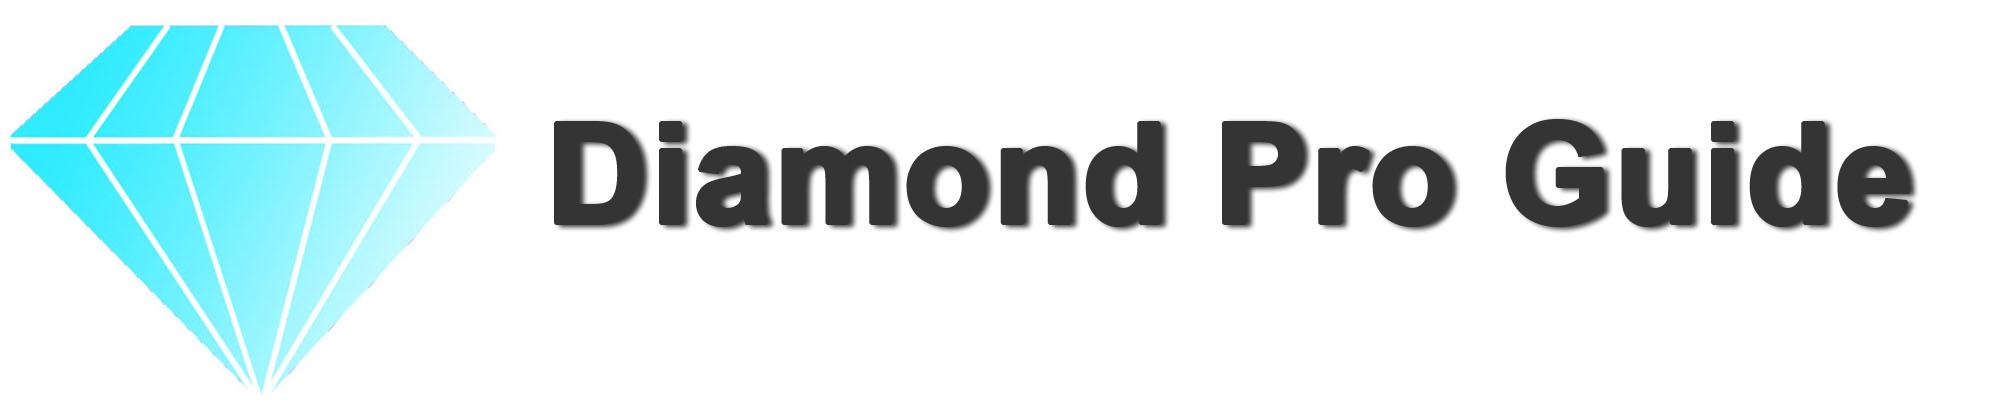 Diamond Pro Guide